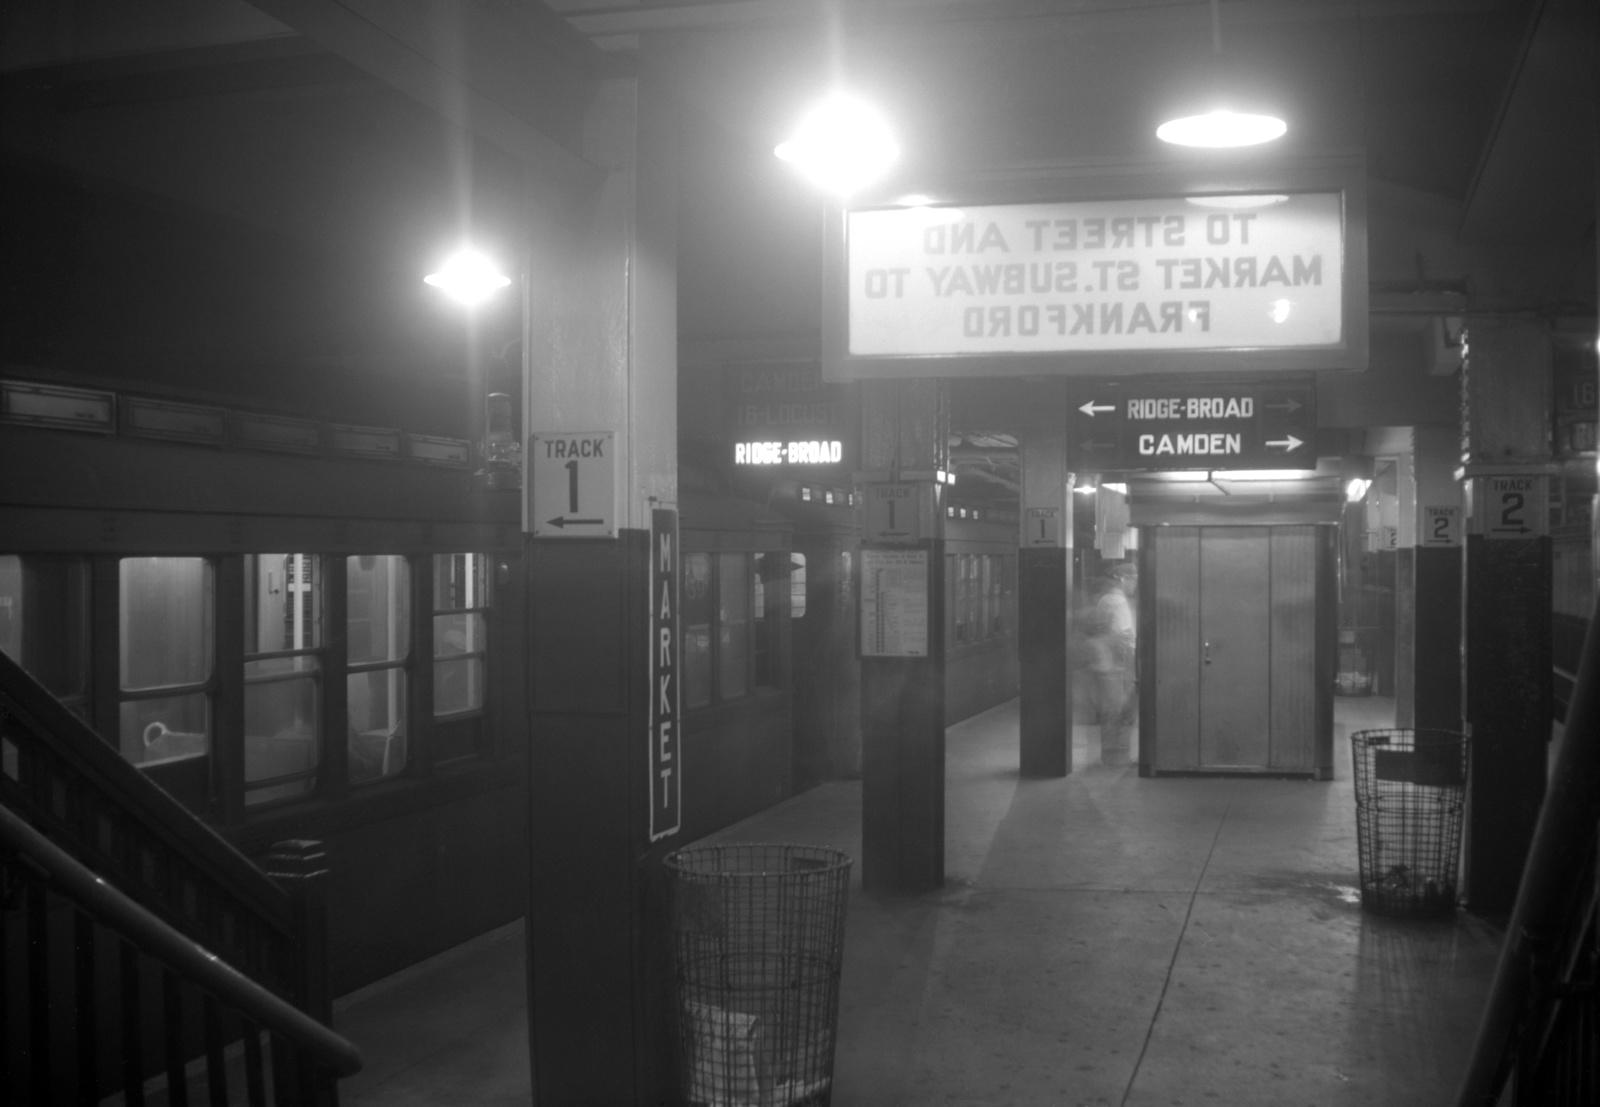 (292k, 1600x1107)<br><b>Country:</b> United States<br><b>City:</b> Philadelphia, PA<br><b>System:</b> SEPTA (or Predecessor)<br><b>Line:</b> Broad Street Subway<br><b>Location:</b> 8th & Market-Ridge<br><b>Collection of:</b> David Pirmann<br><b>Date:</b> 10/15/1960<br><b>Viewed (this week/total):</b> 0 / 138